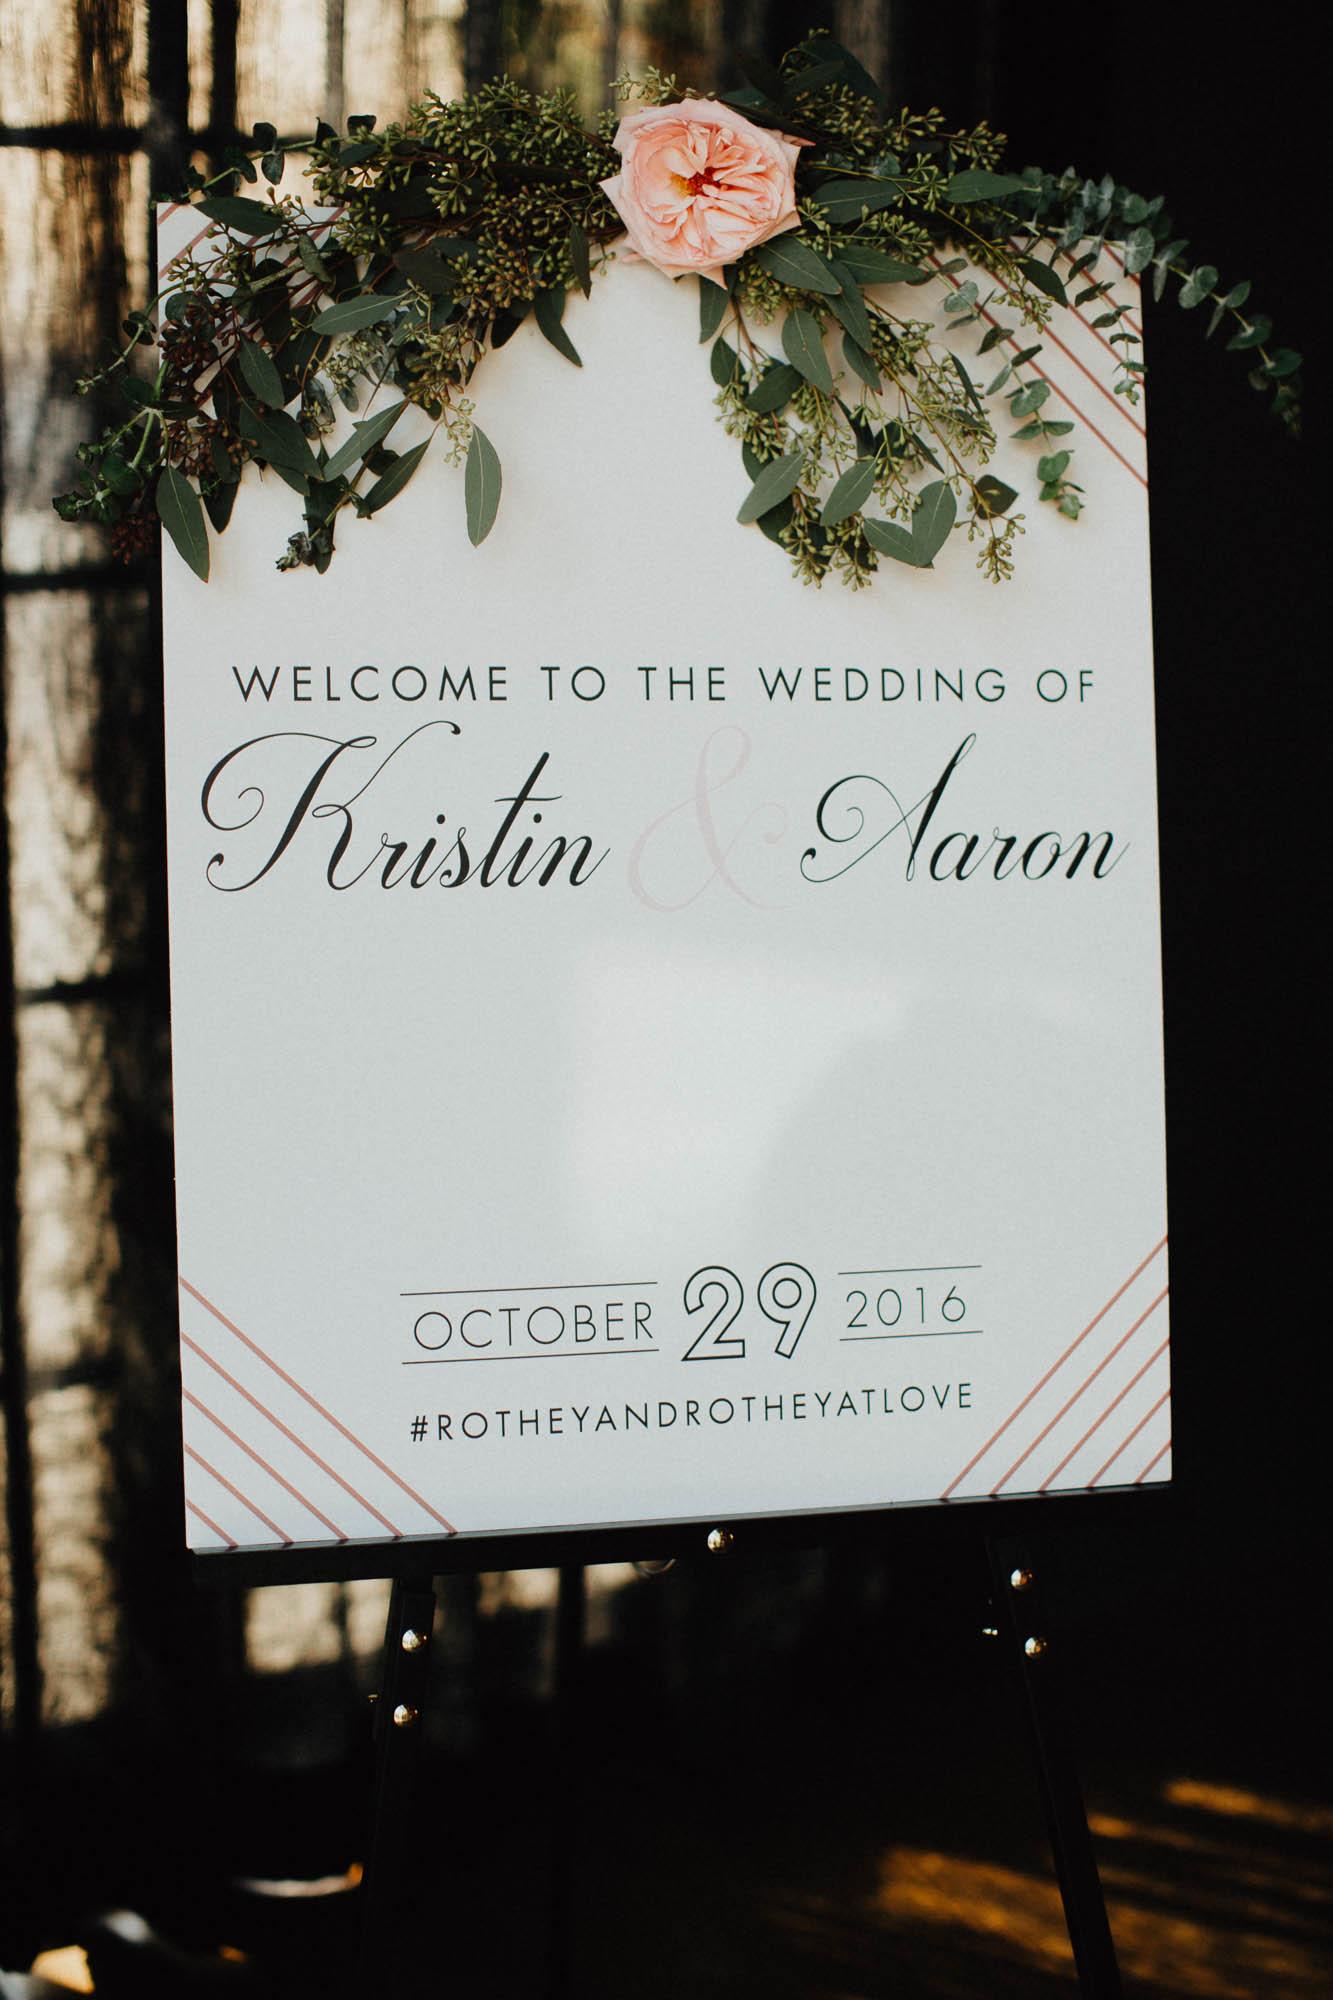 Highline-Car-House-Wedding-Columbus-Kristin-Aaron-096.jpg